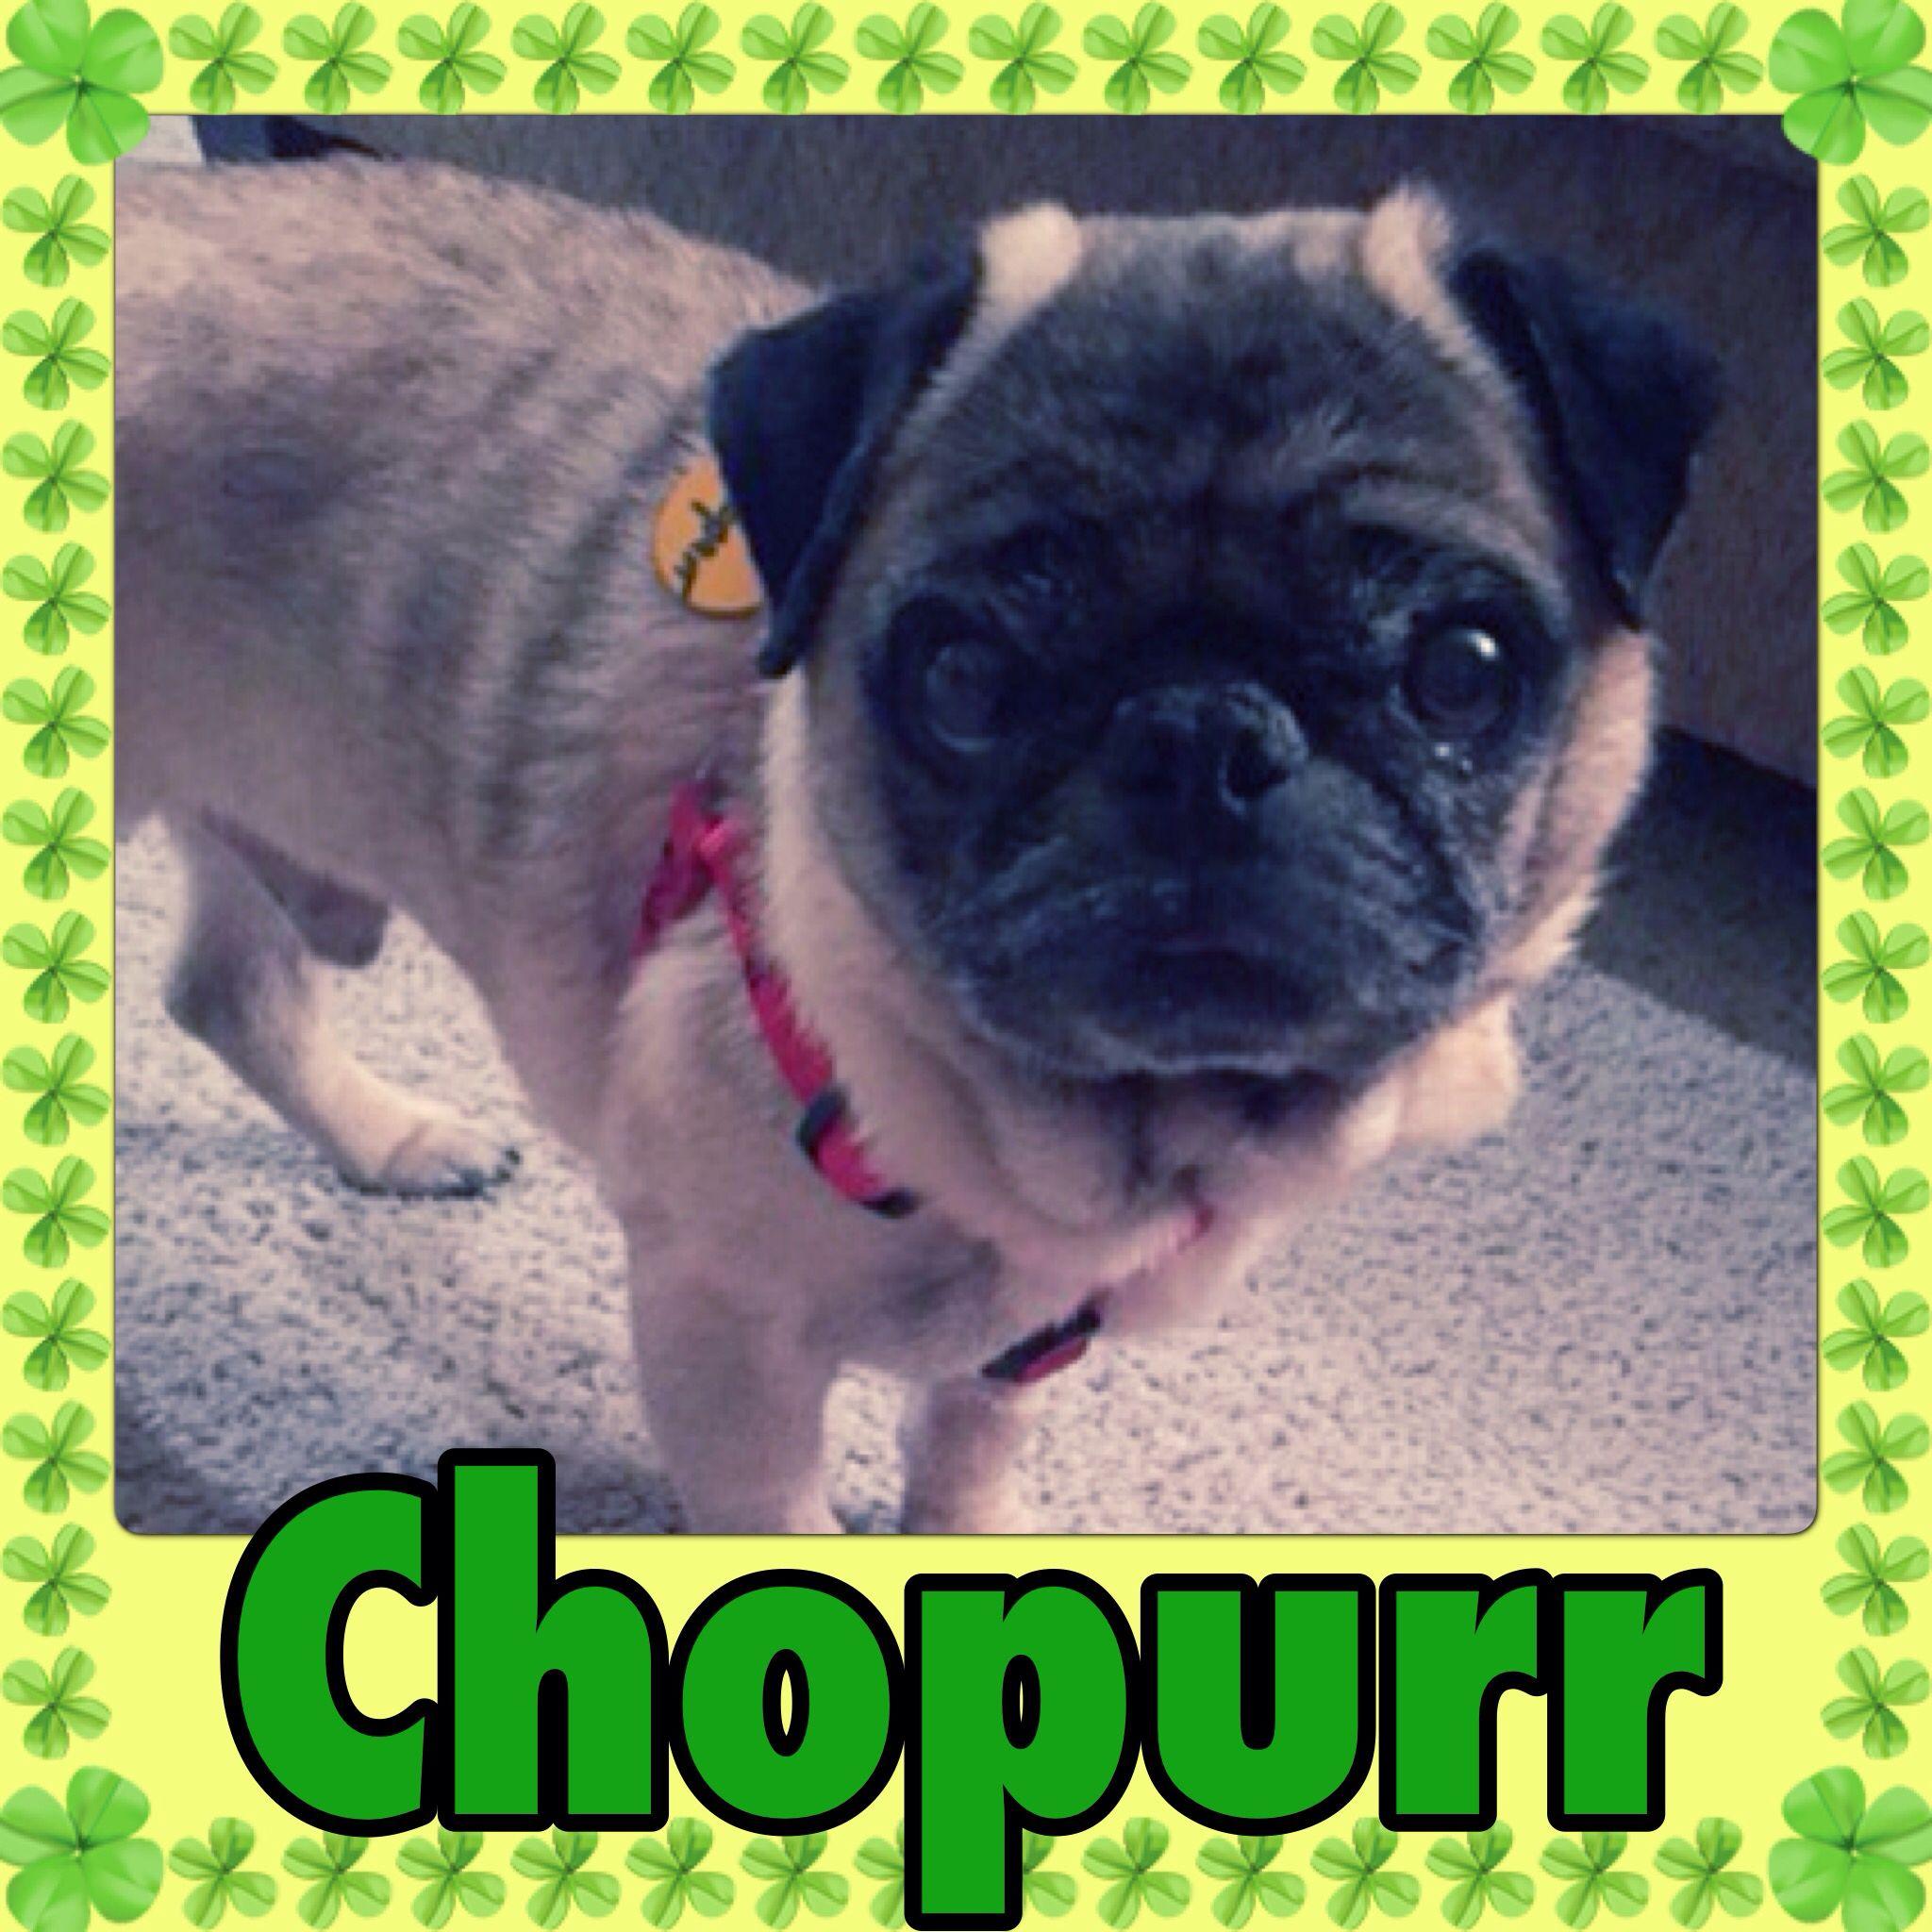 Hey Everyone I M Chopurr And I Am A Tiny 7 Year Old Pug Boy Who